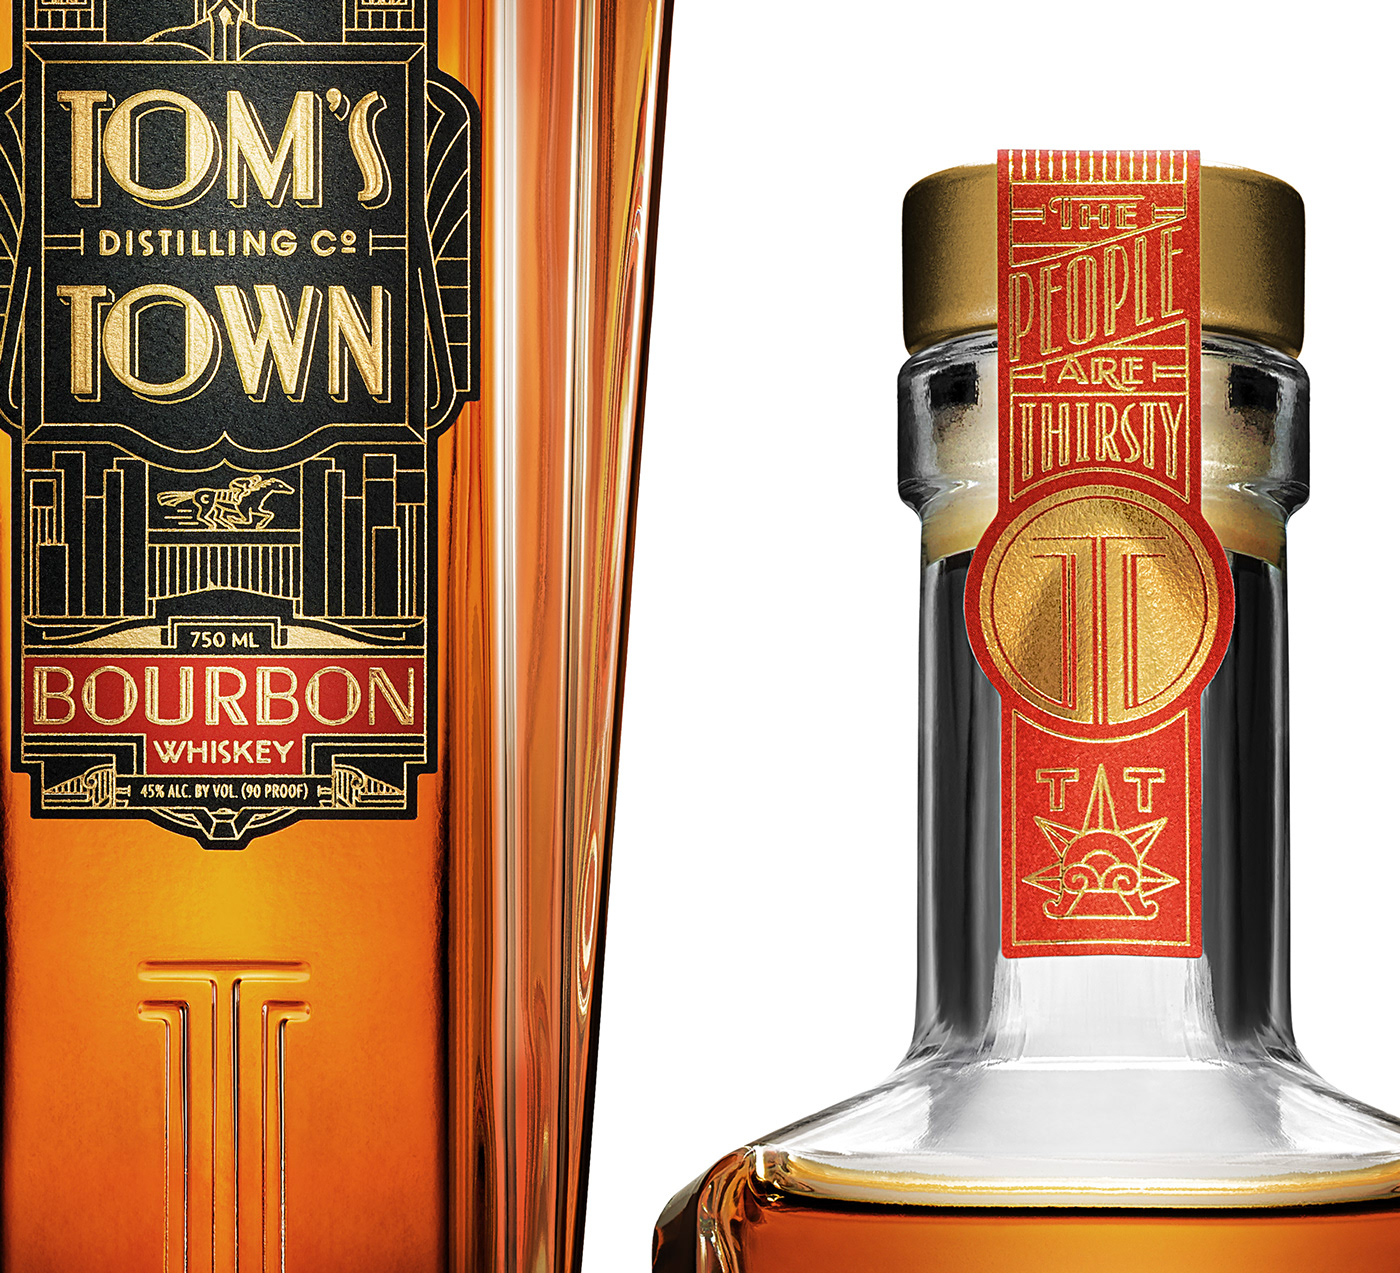 product design  branding  Packaging design Spirits distilleries